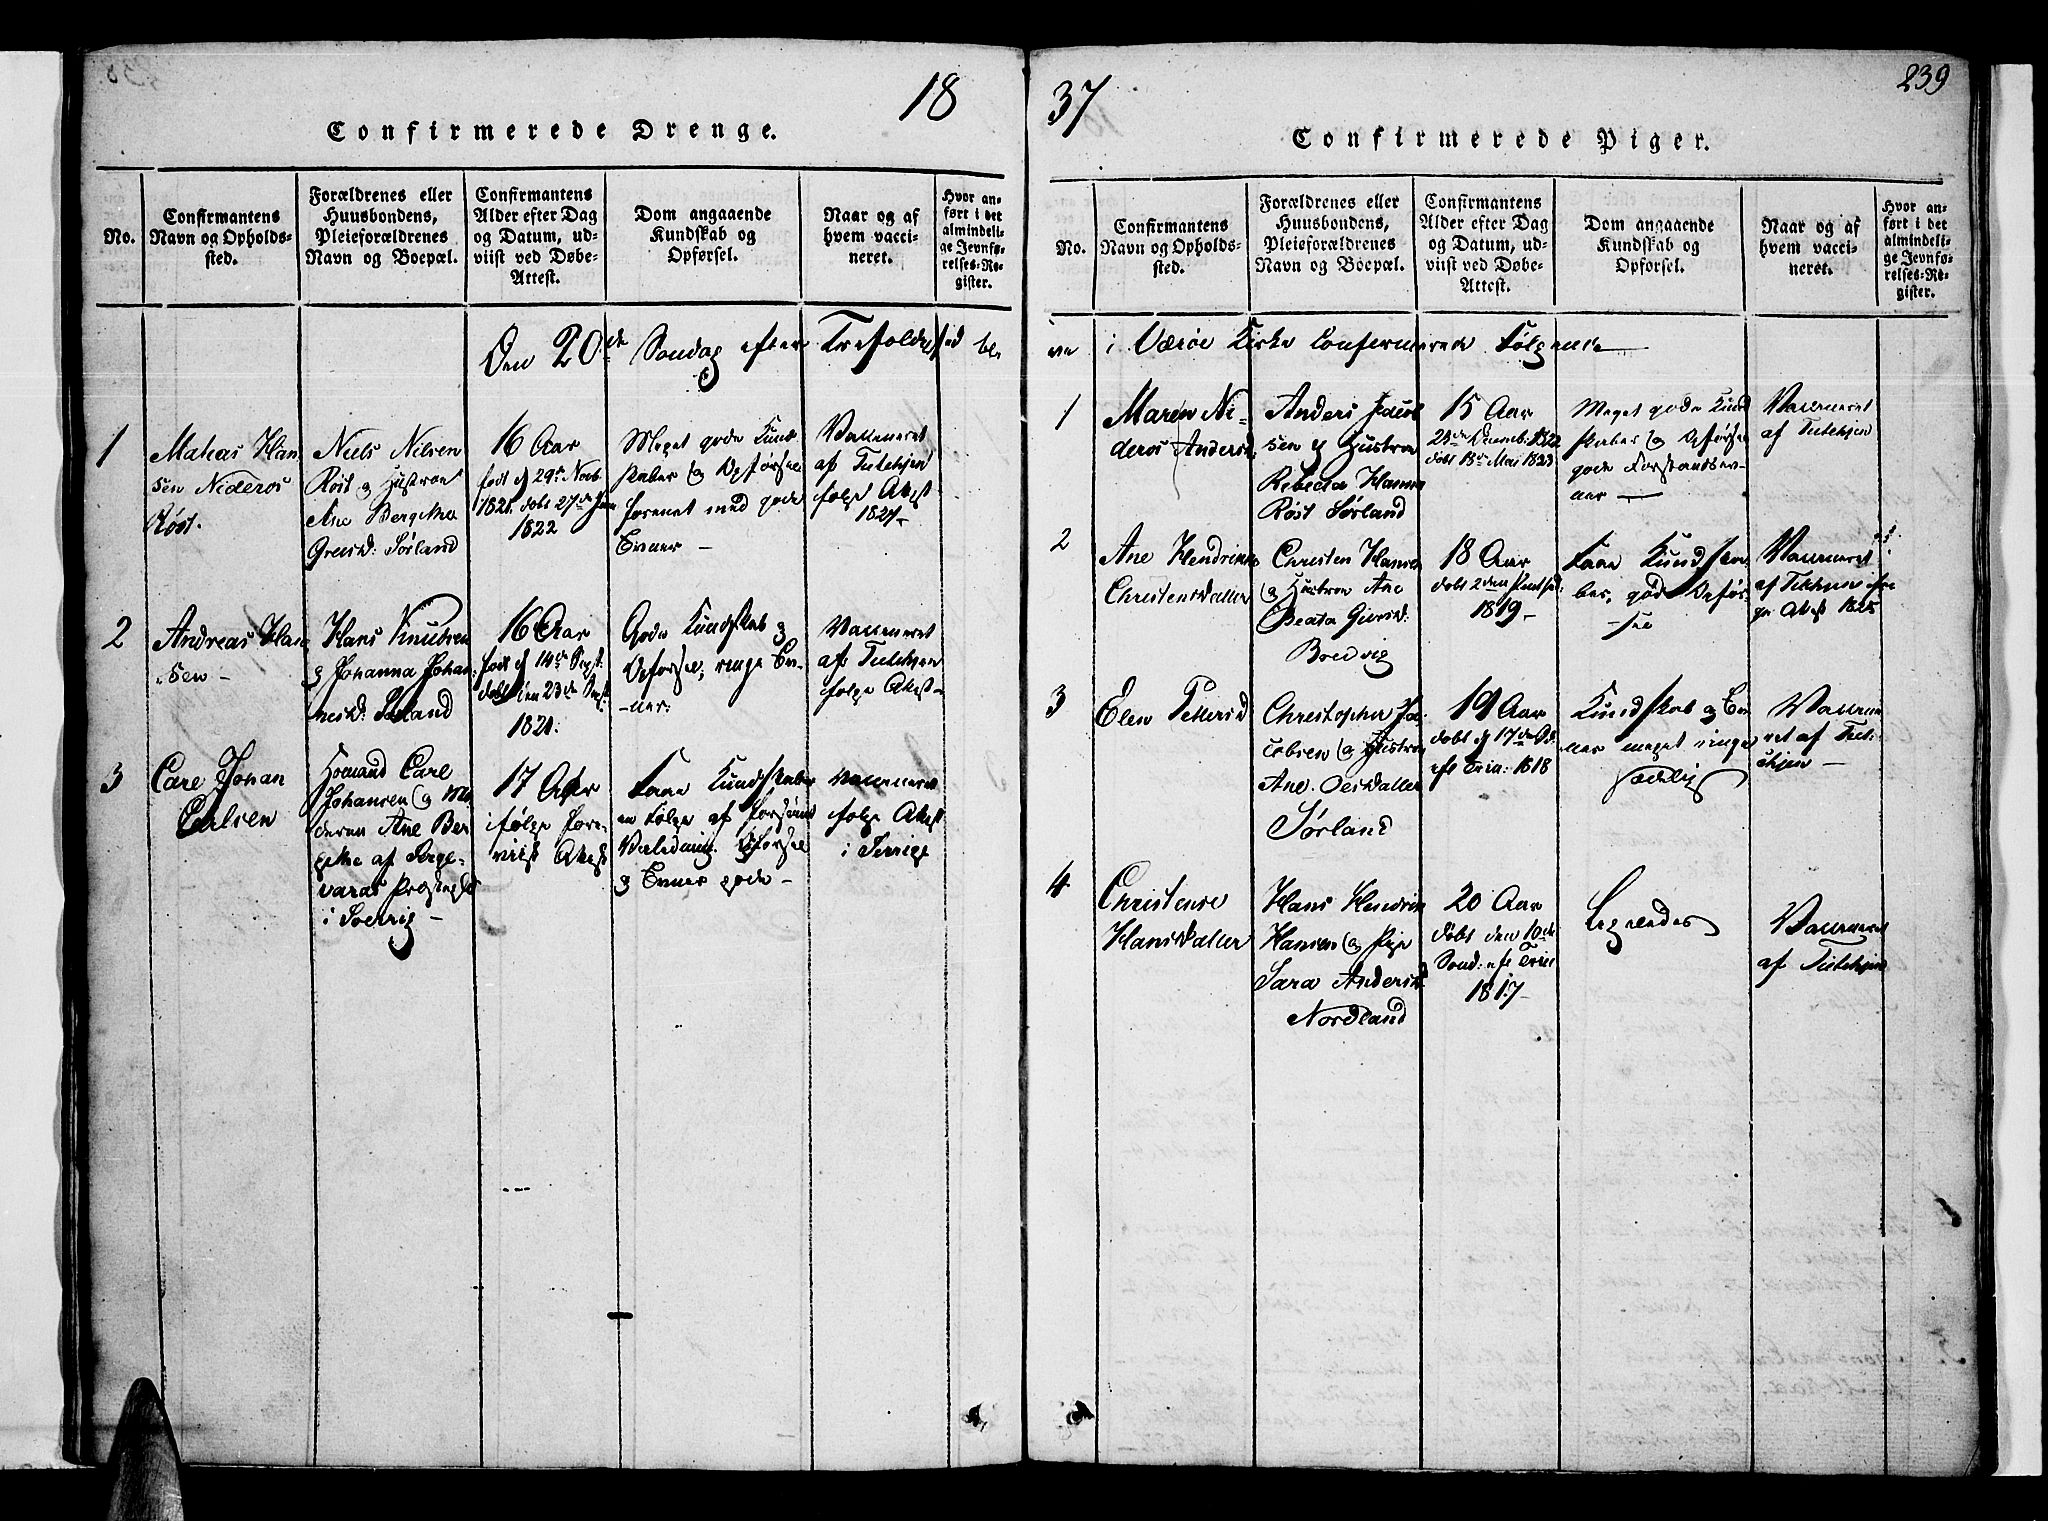 SAT, Ministerialprotokoller, klokkerbøker og fødselsregistre - Nordland, 807/L0120: Ministerialbok nr. 807A03, 1821-1848, s. 239